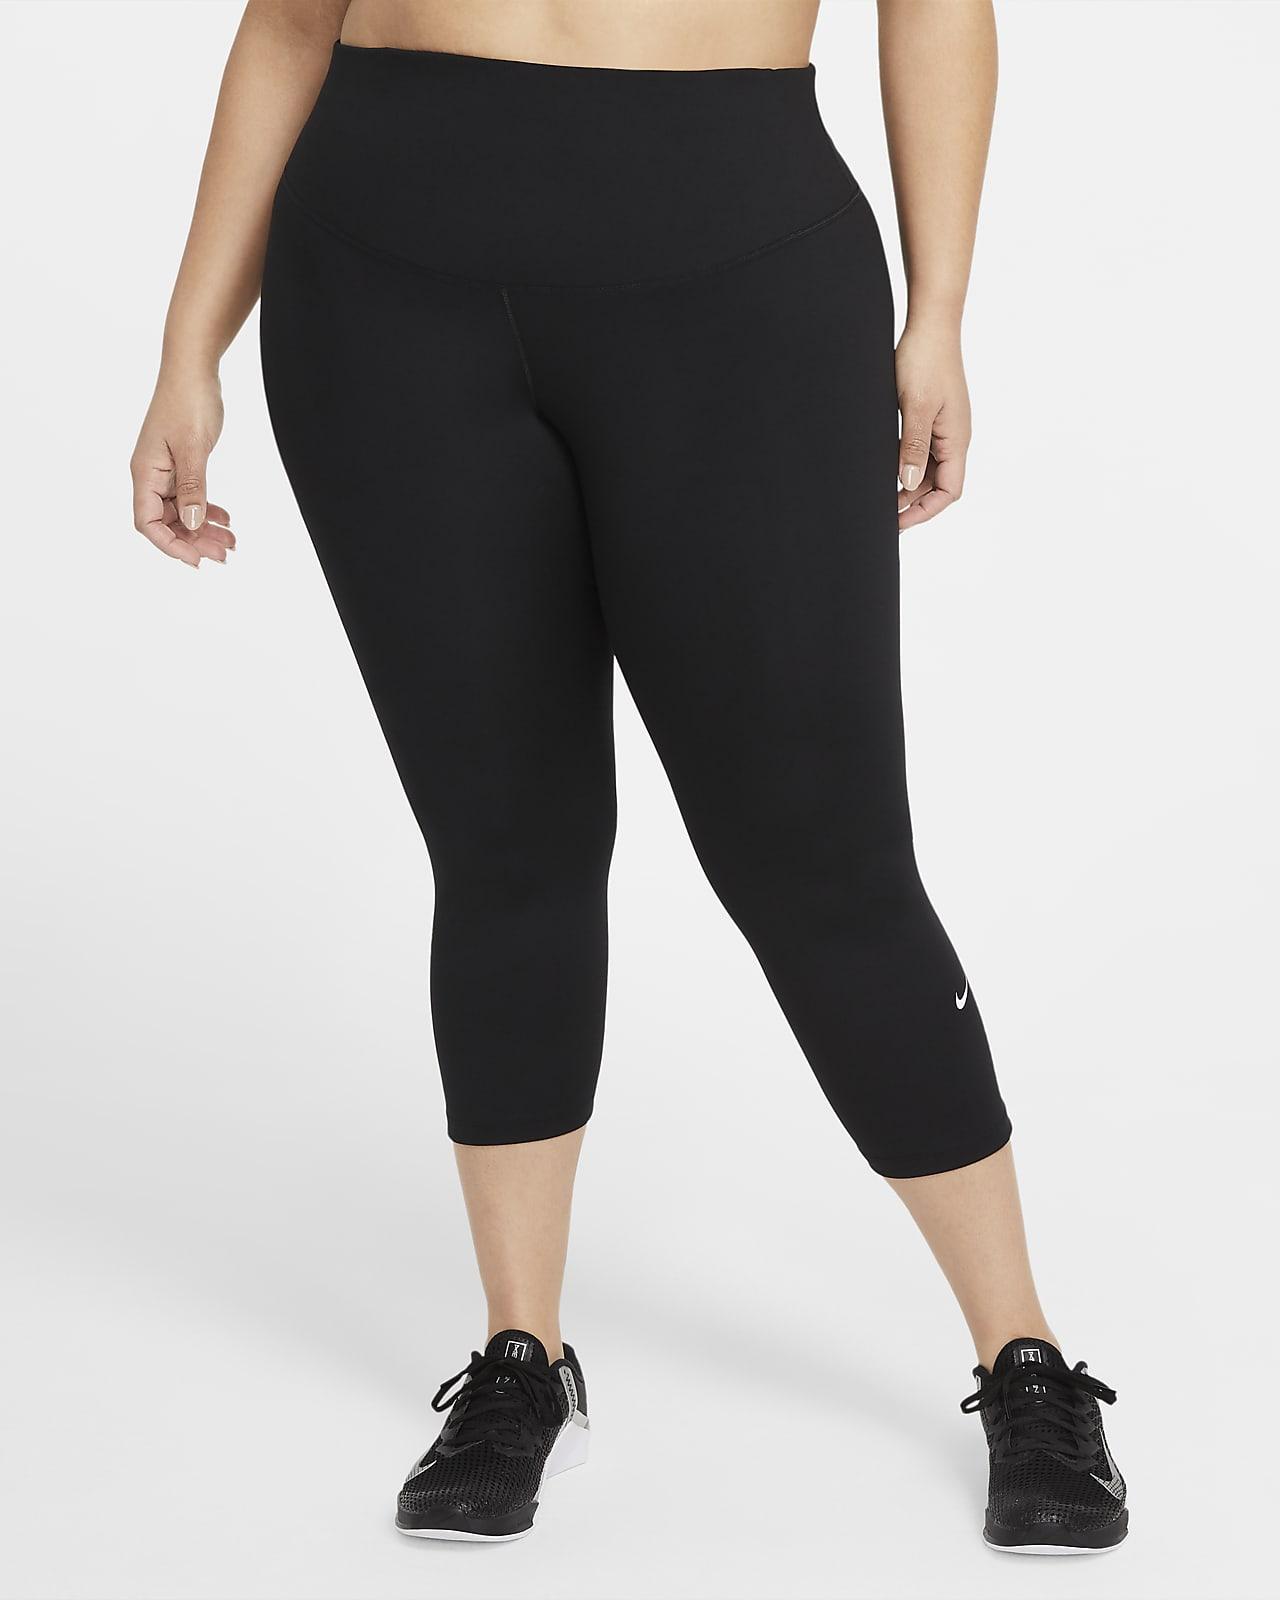 Leggings a lunghezza ridotta e vita media Nike One (Plus size) - Donna